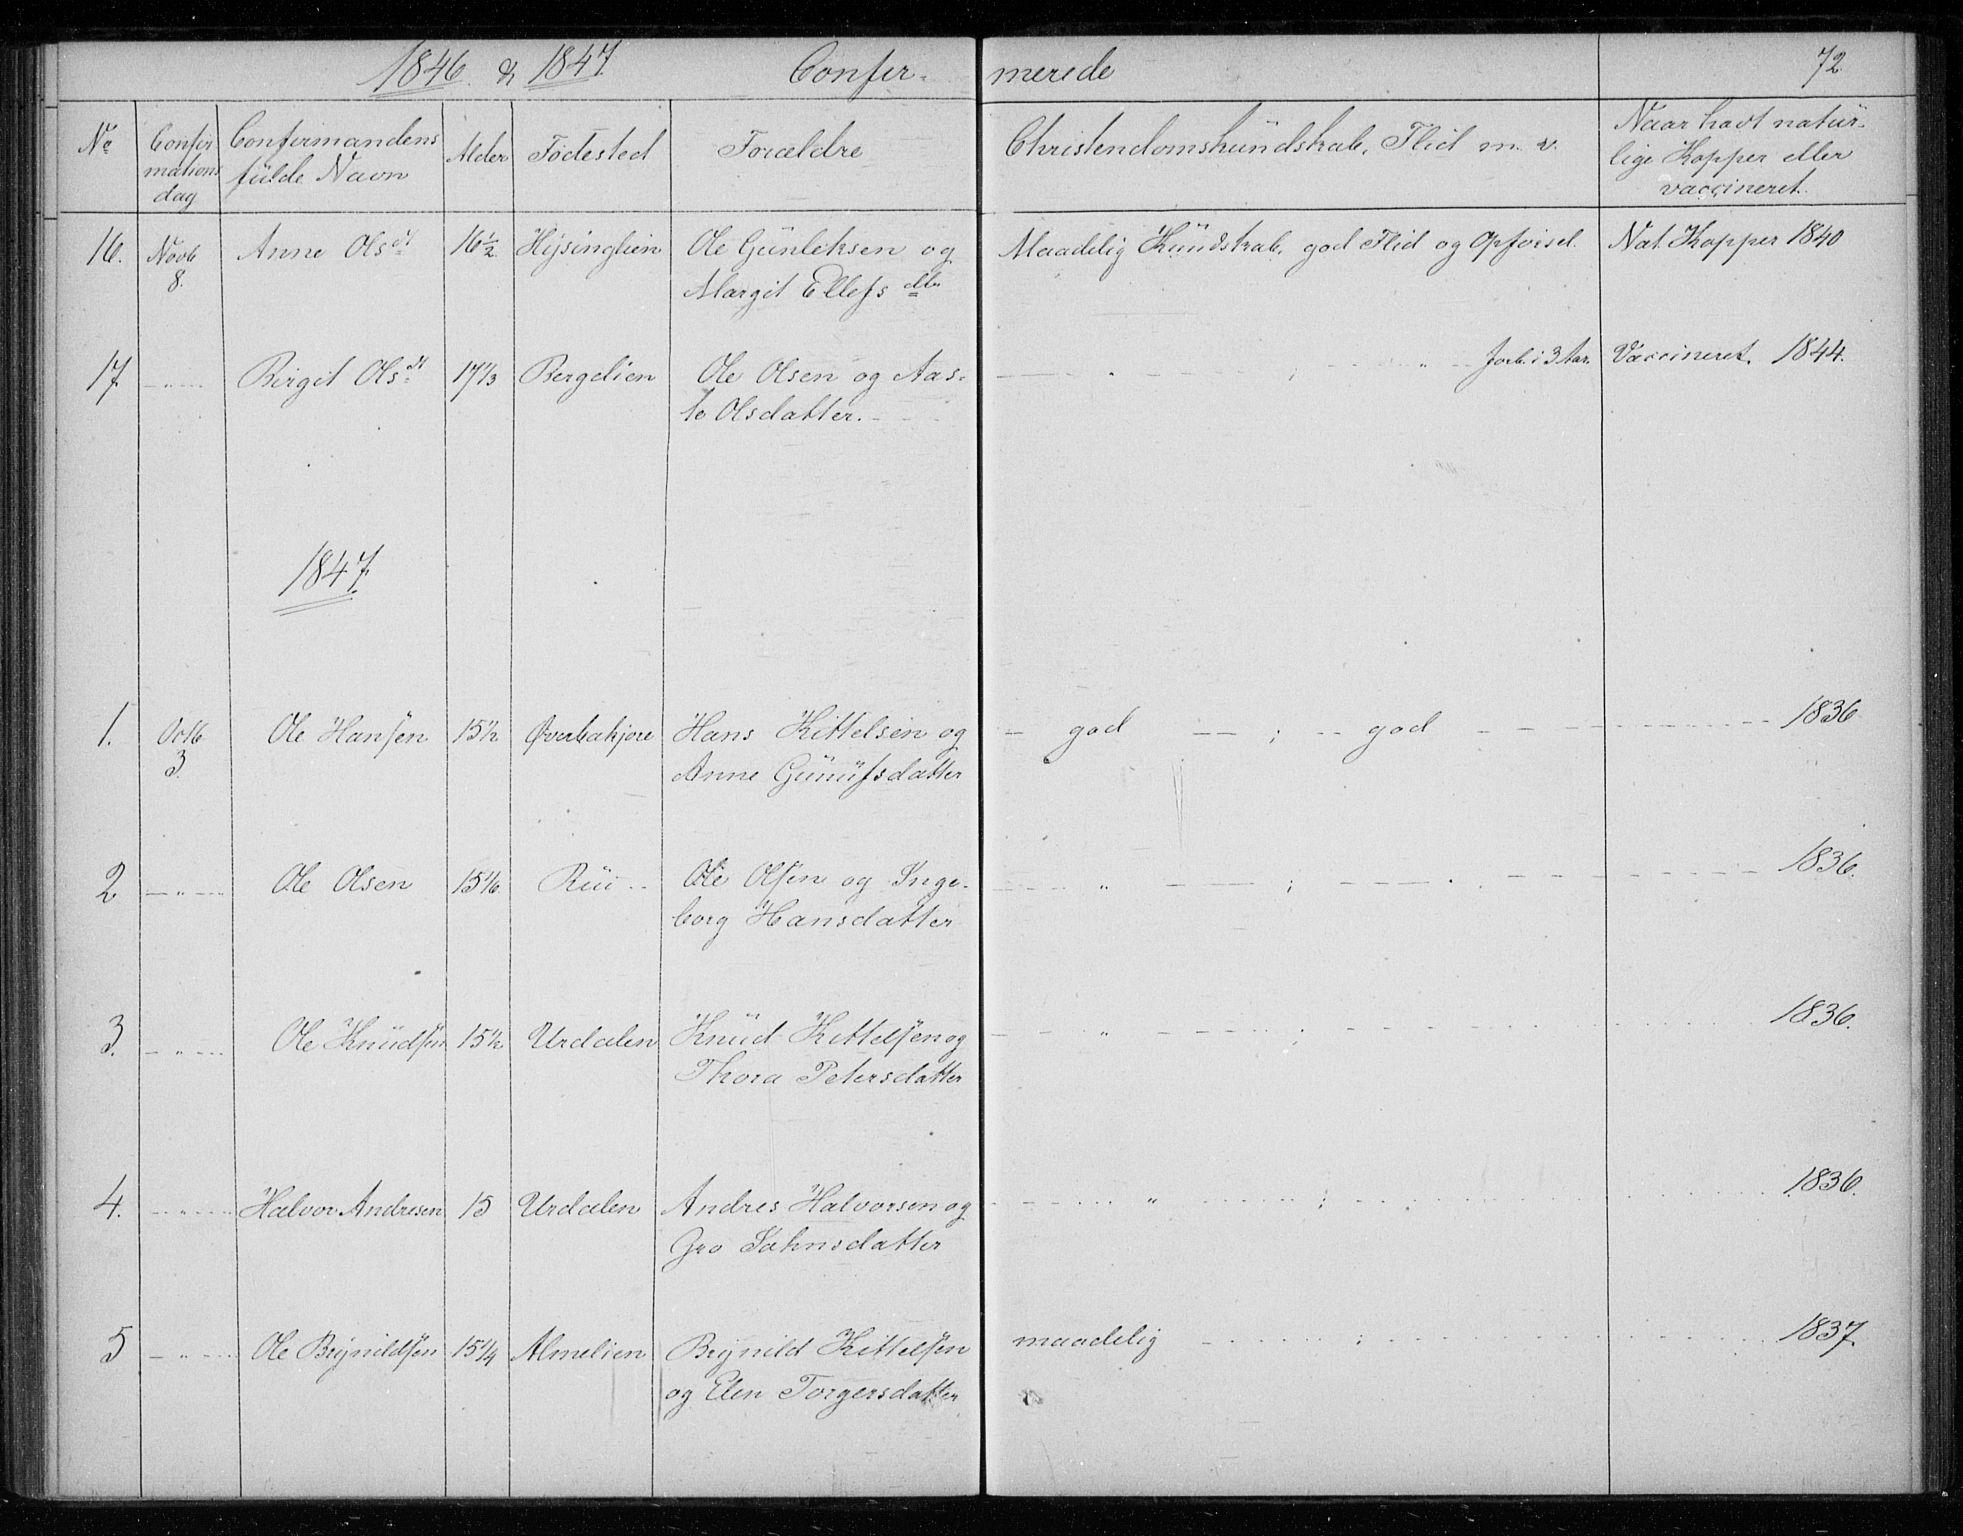 SAKO, Gransherad kirkebøker, F/Fb/L0003: Ministerialbok nr. II 3, 1844-1859, s. 72